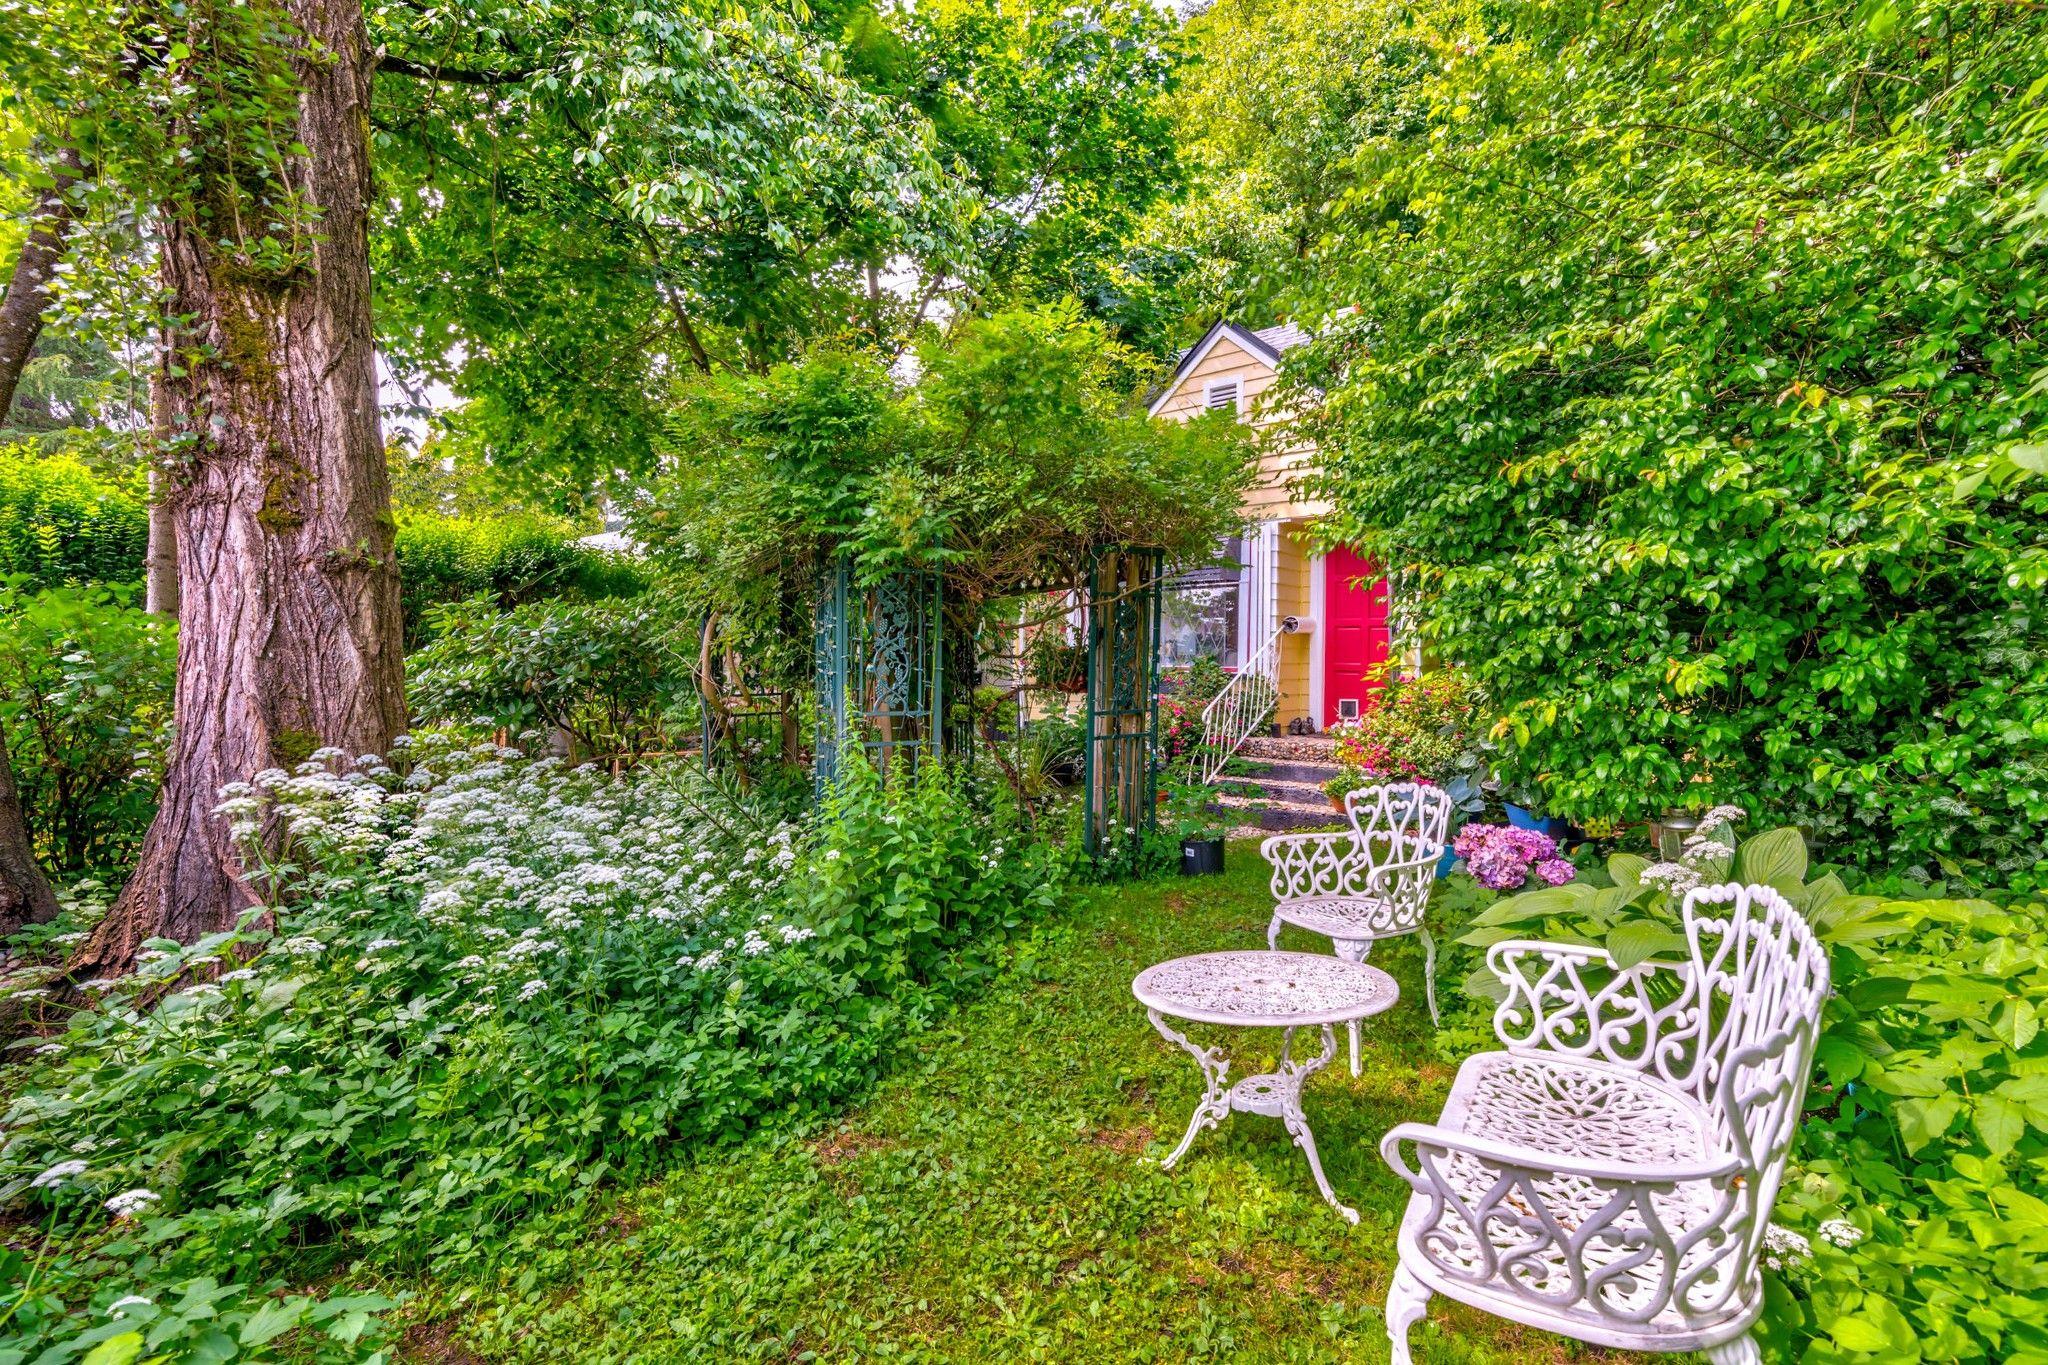 Photo 5: Photos: 20623 114 Avenue in Maple Ridge: Southwest Maple Ridge House for sale : MLS®# R2465656